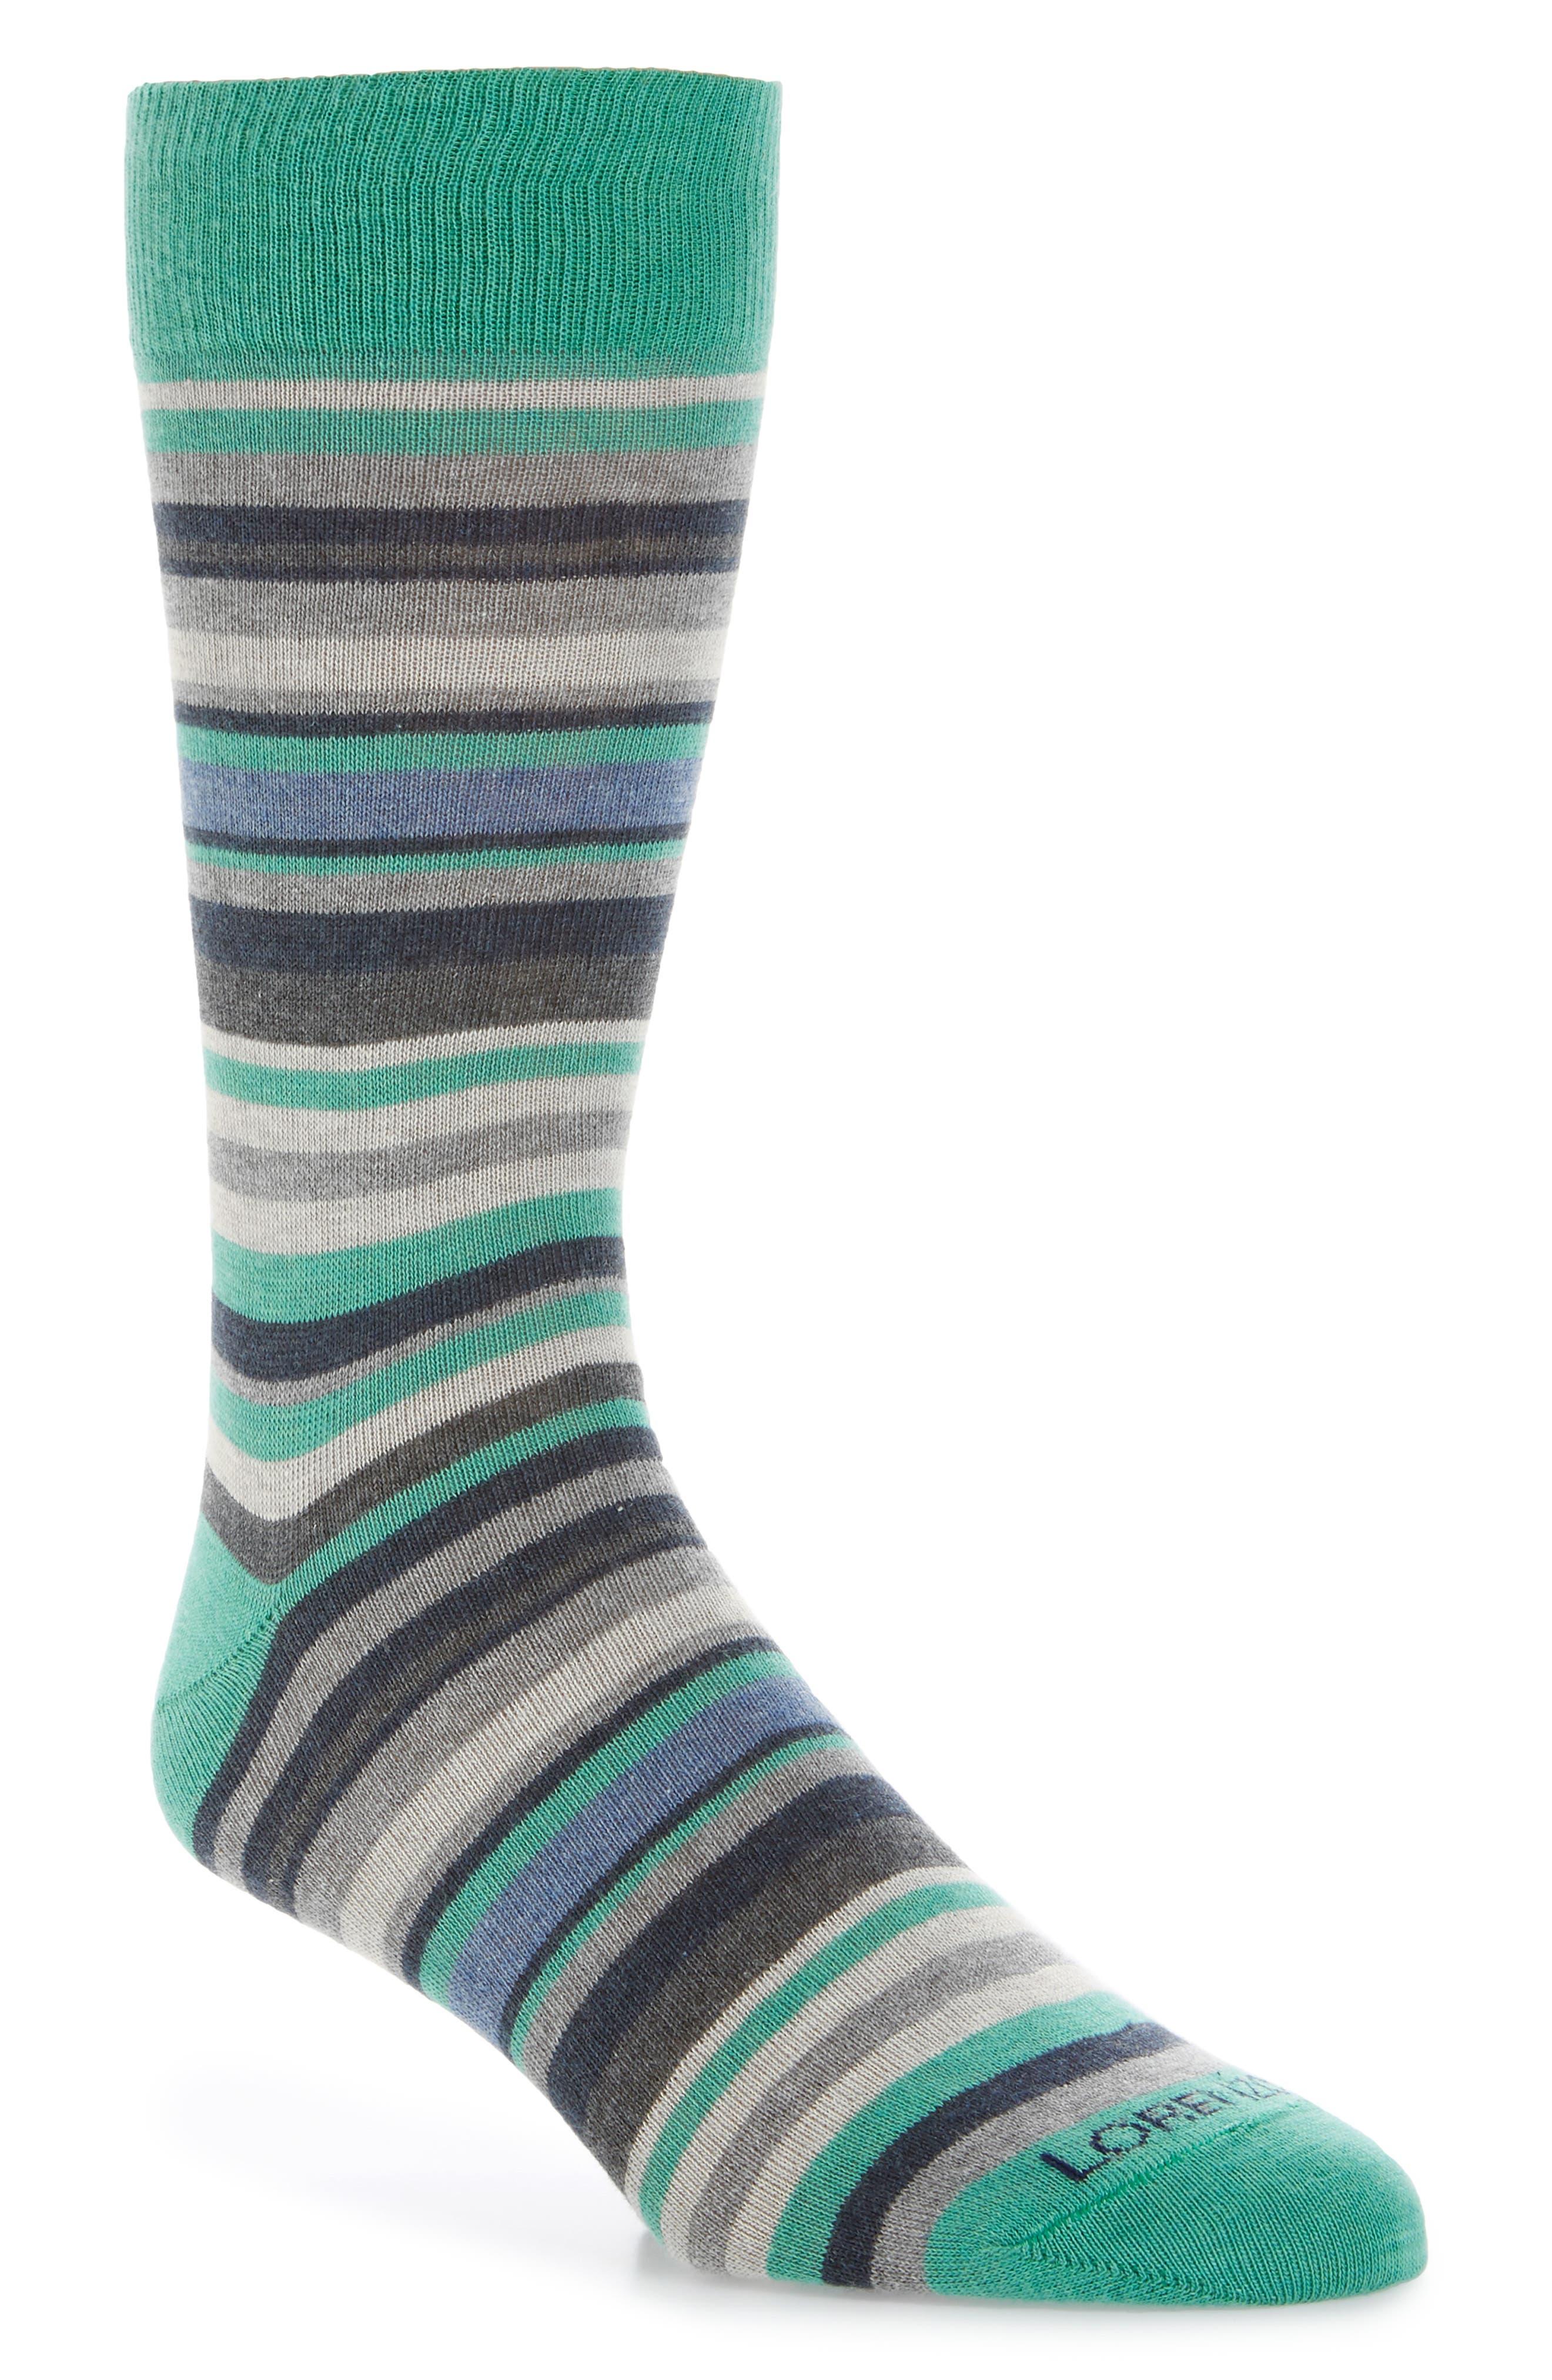 Stripe Cotton Blend Socks,                         Main,                         color, 021